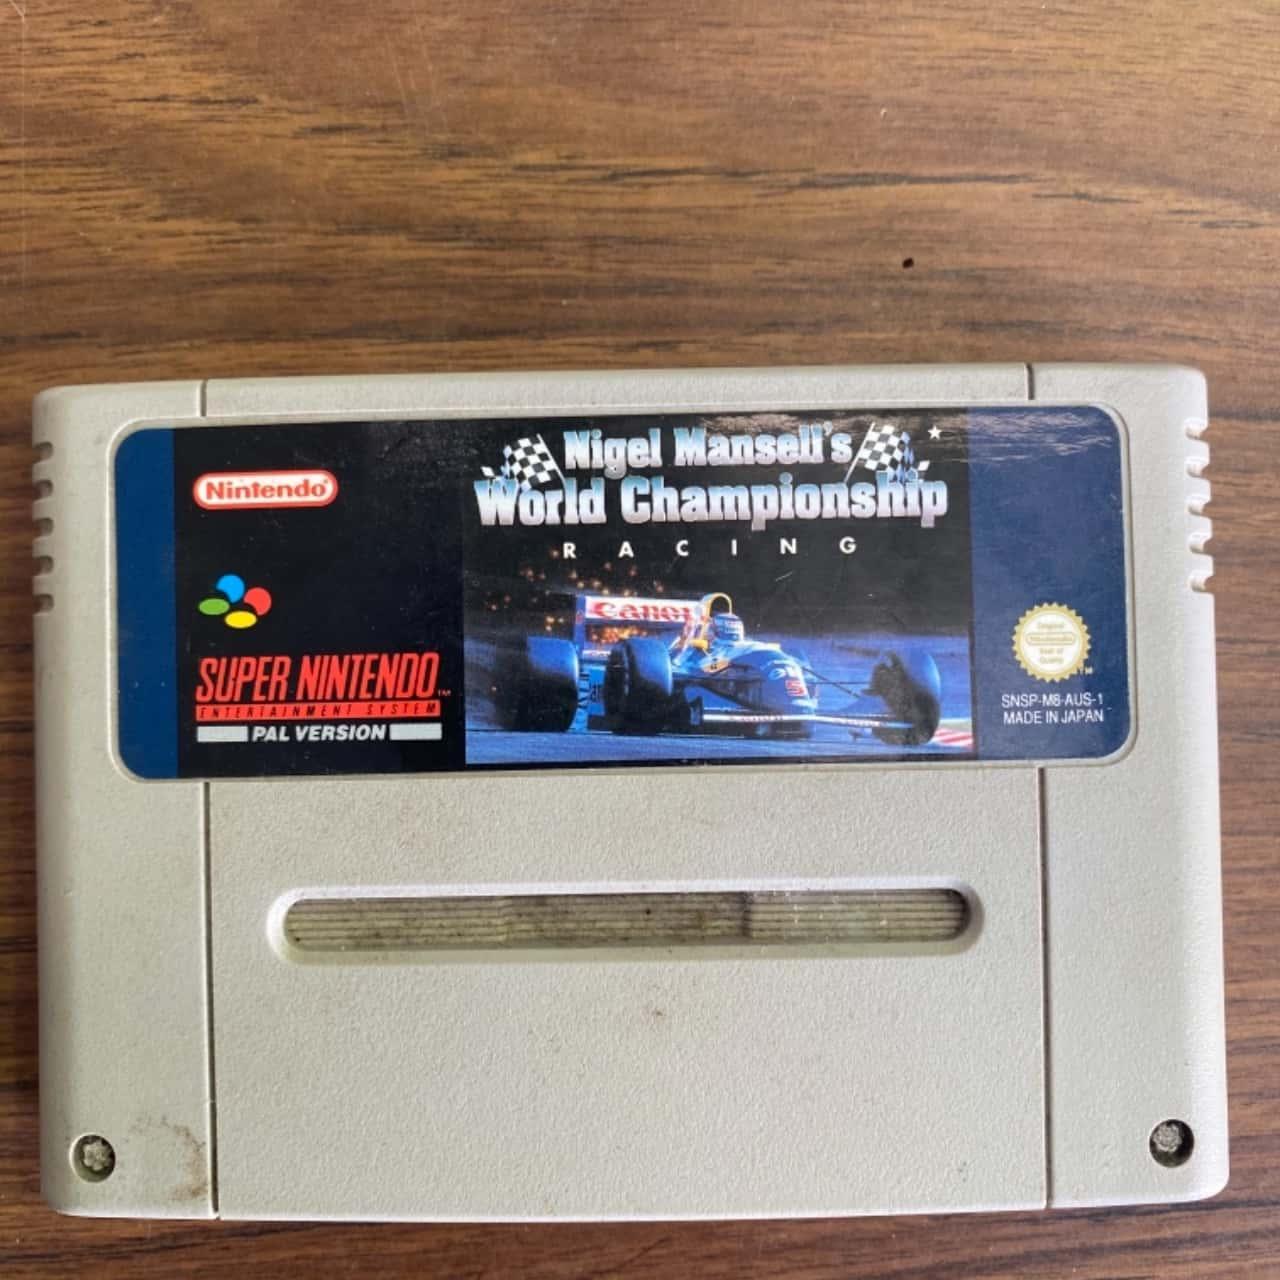 Super Nintendo Nigel Mansells World Championship Racing